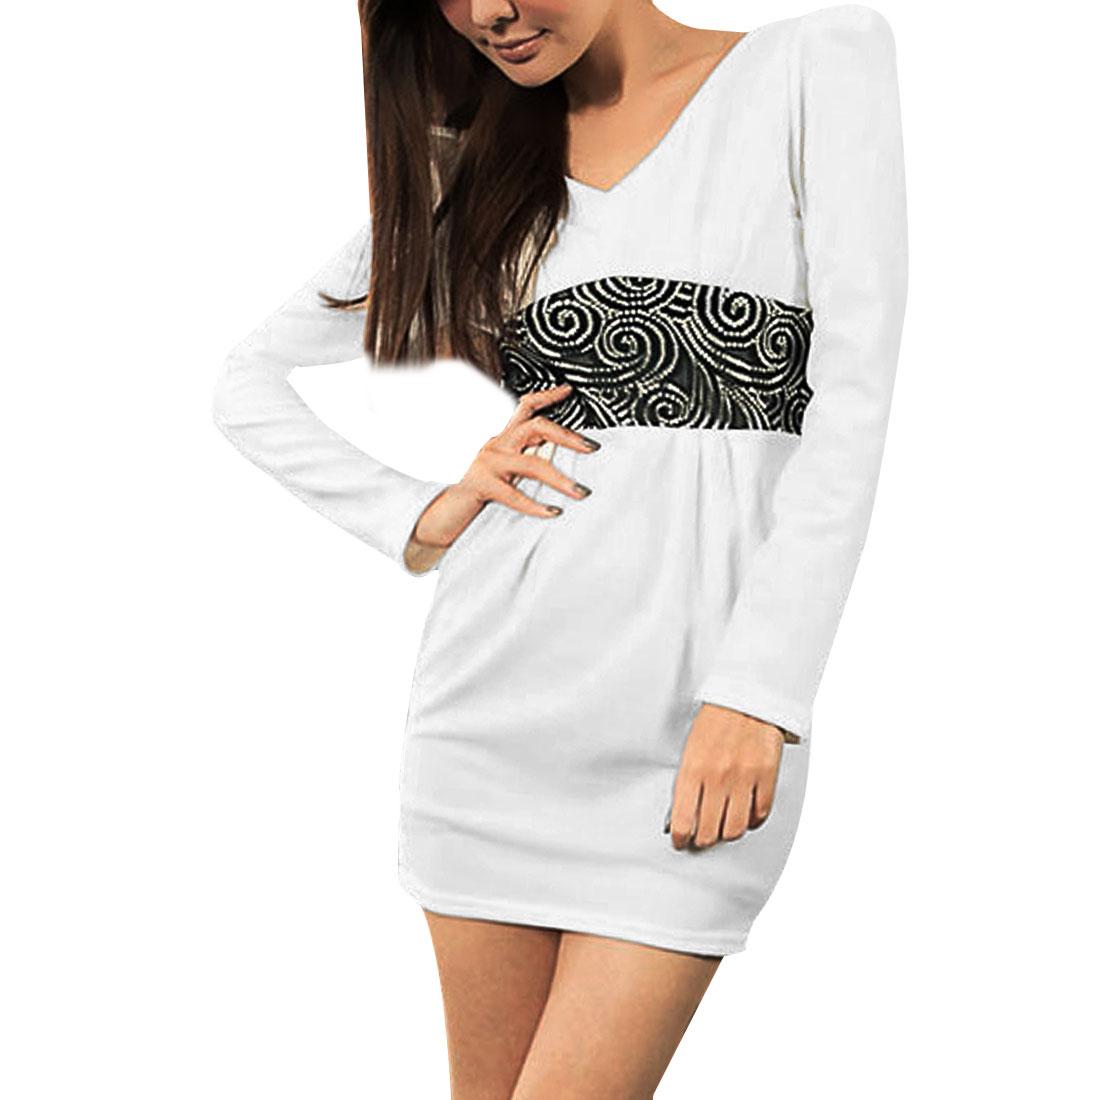 Ladies Black Lace Accent Double V Neck White Sheath Mini Dress XS